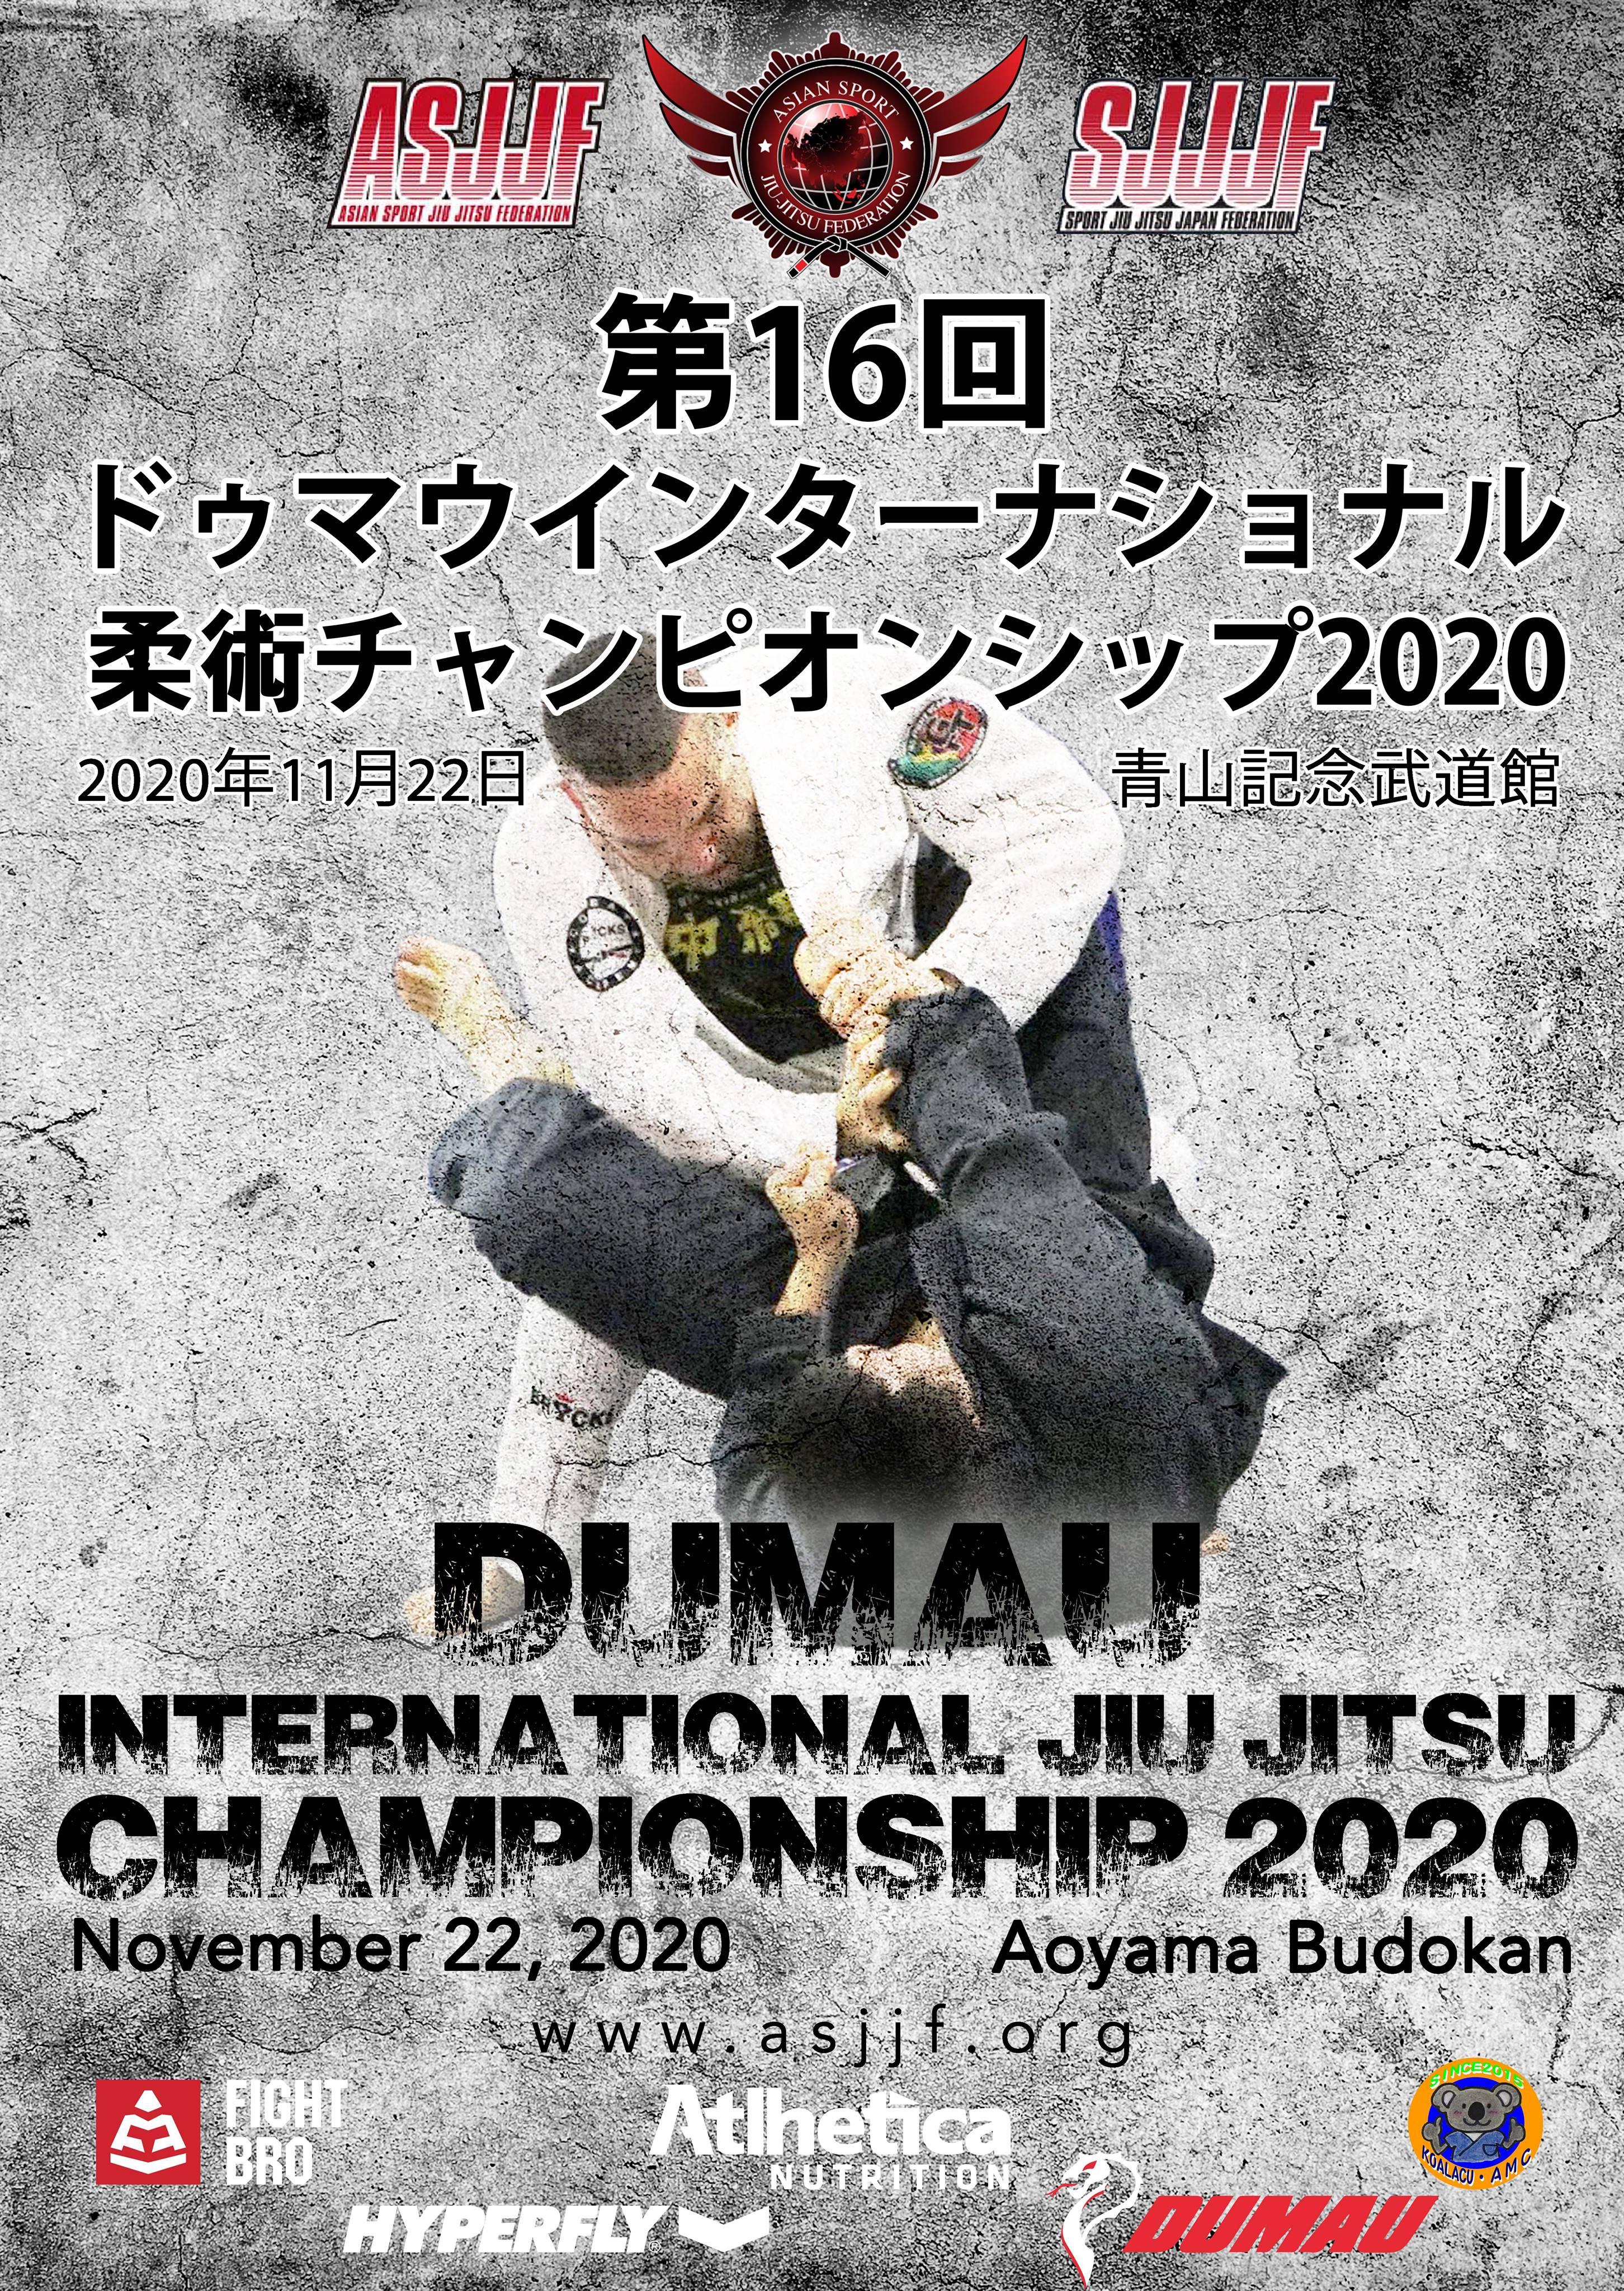 asjjf dumau international jiu jitsu championship 2020 (第16回ドゥマウインターナショナル柔術チャンピオンシップ)